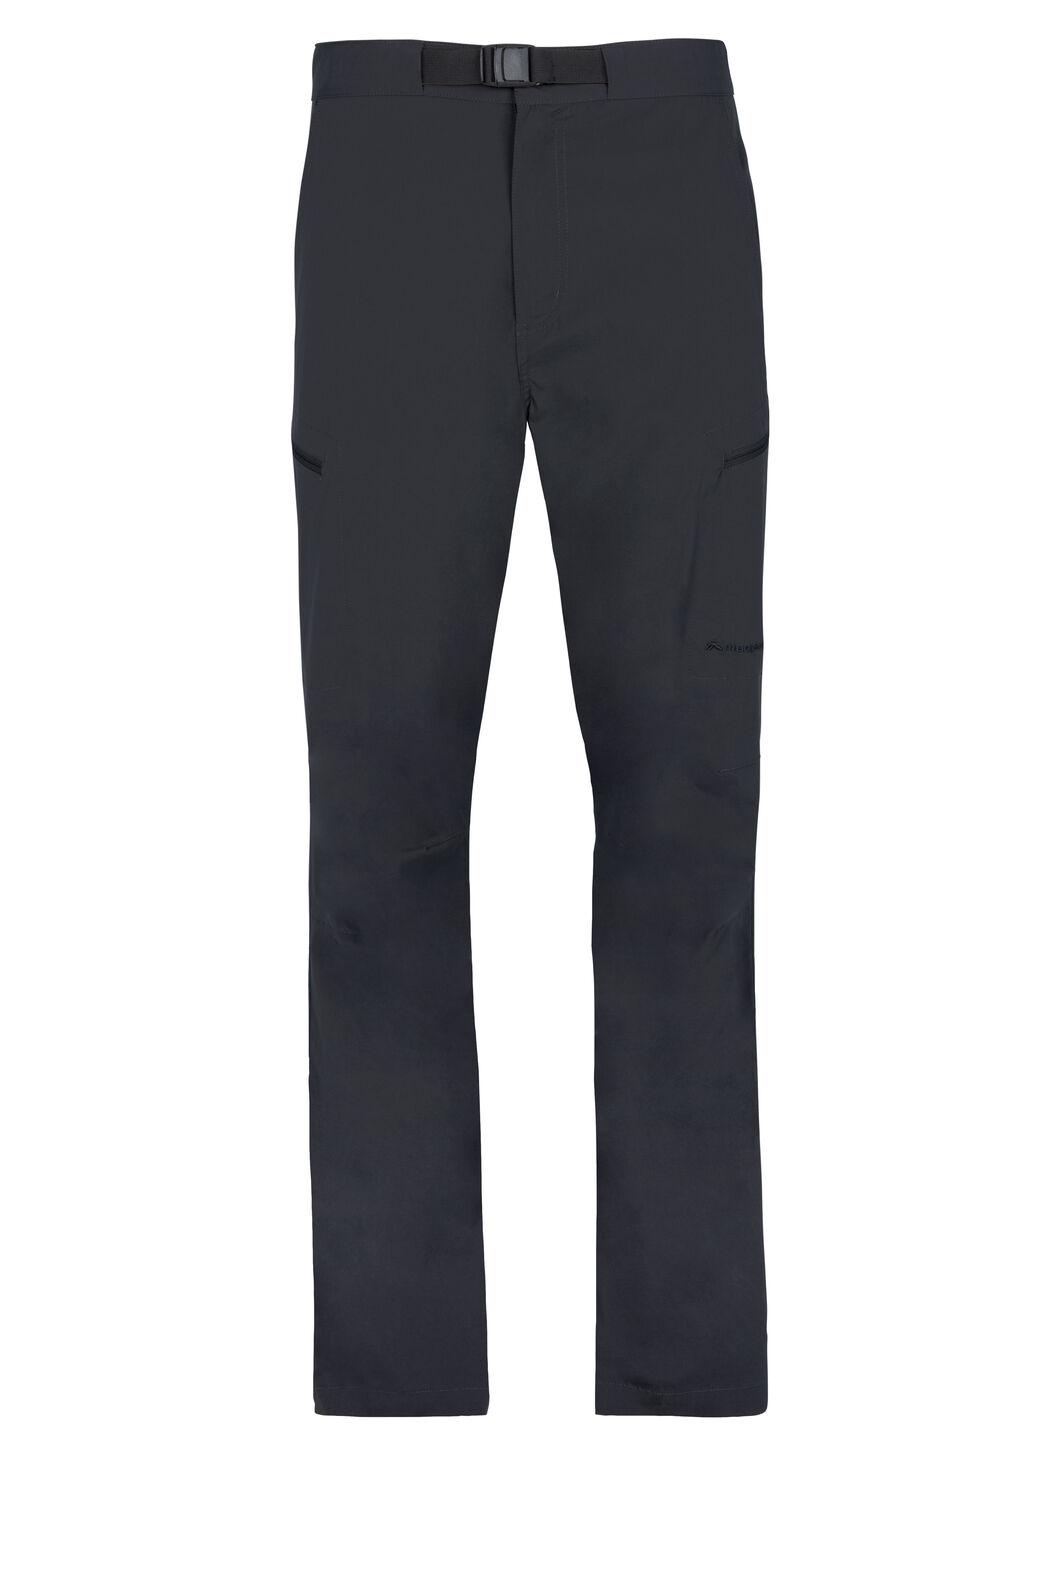 Macpac Drift Pants — Men's, Black, hi-res